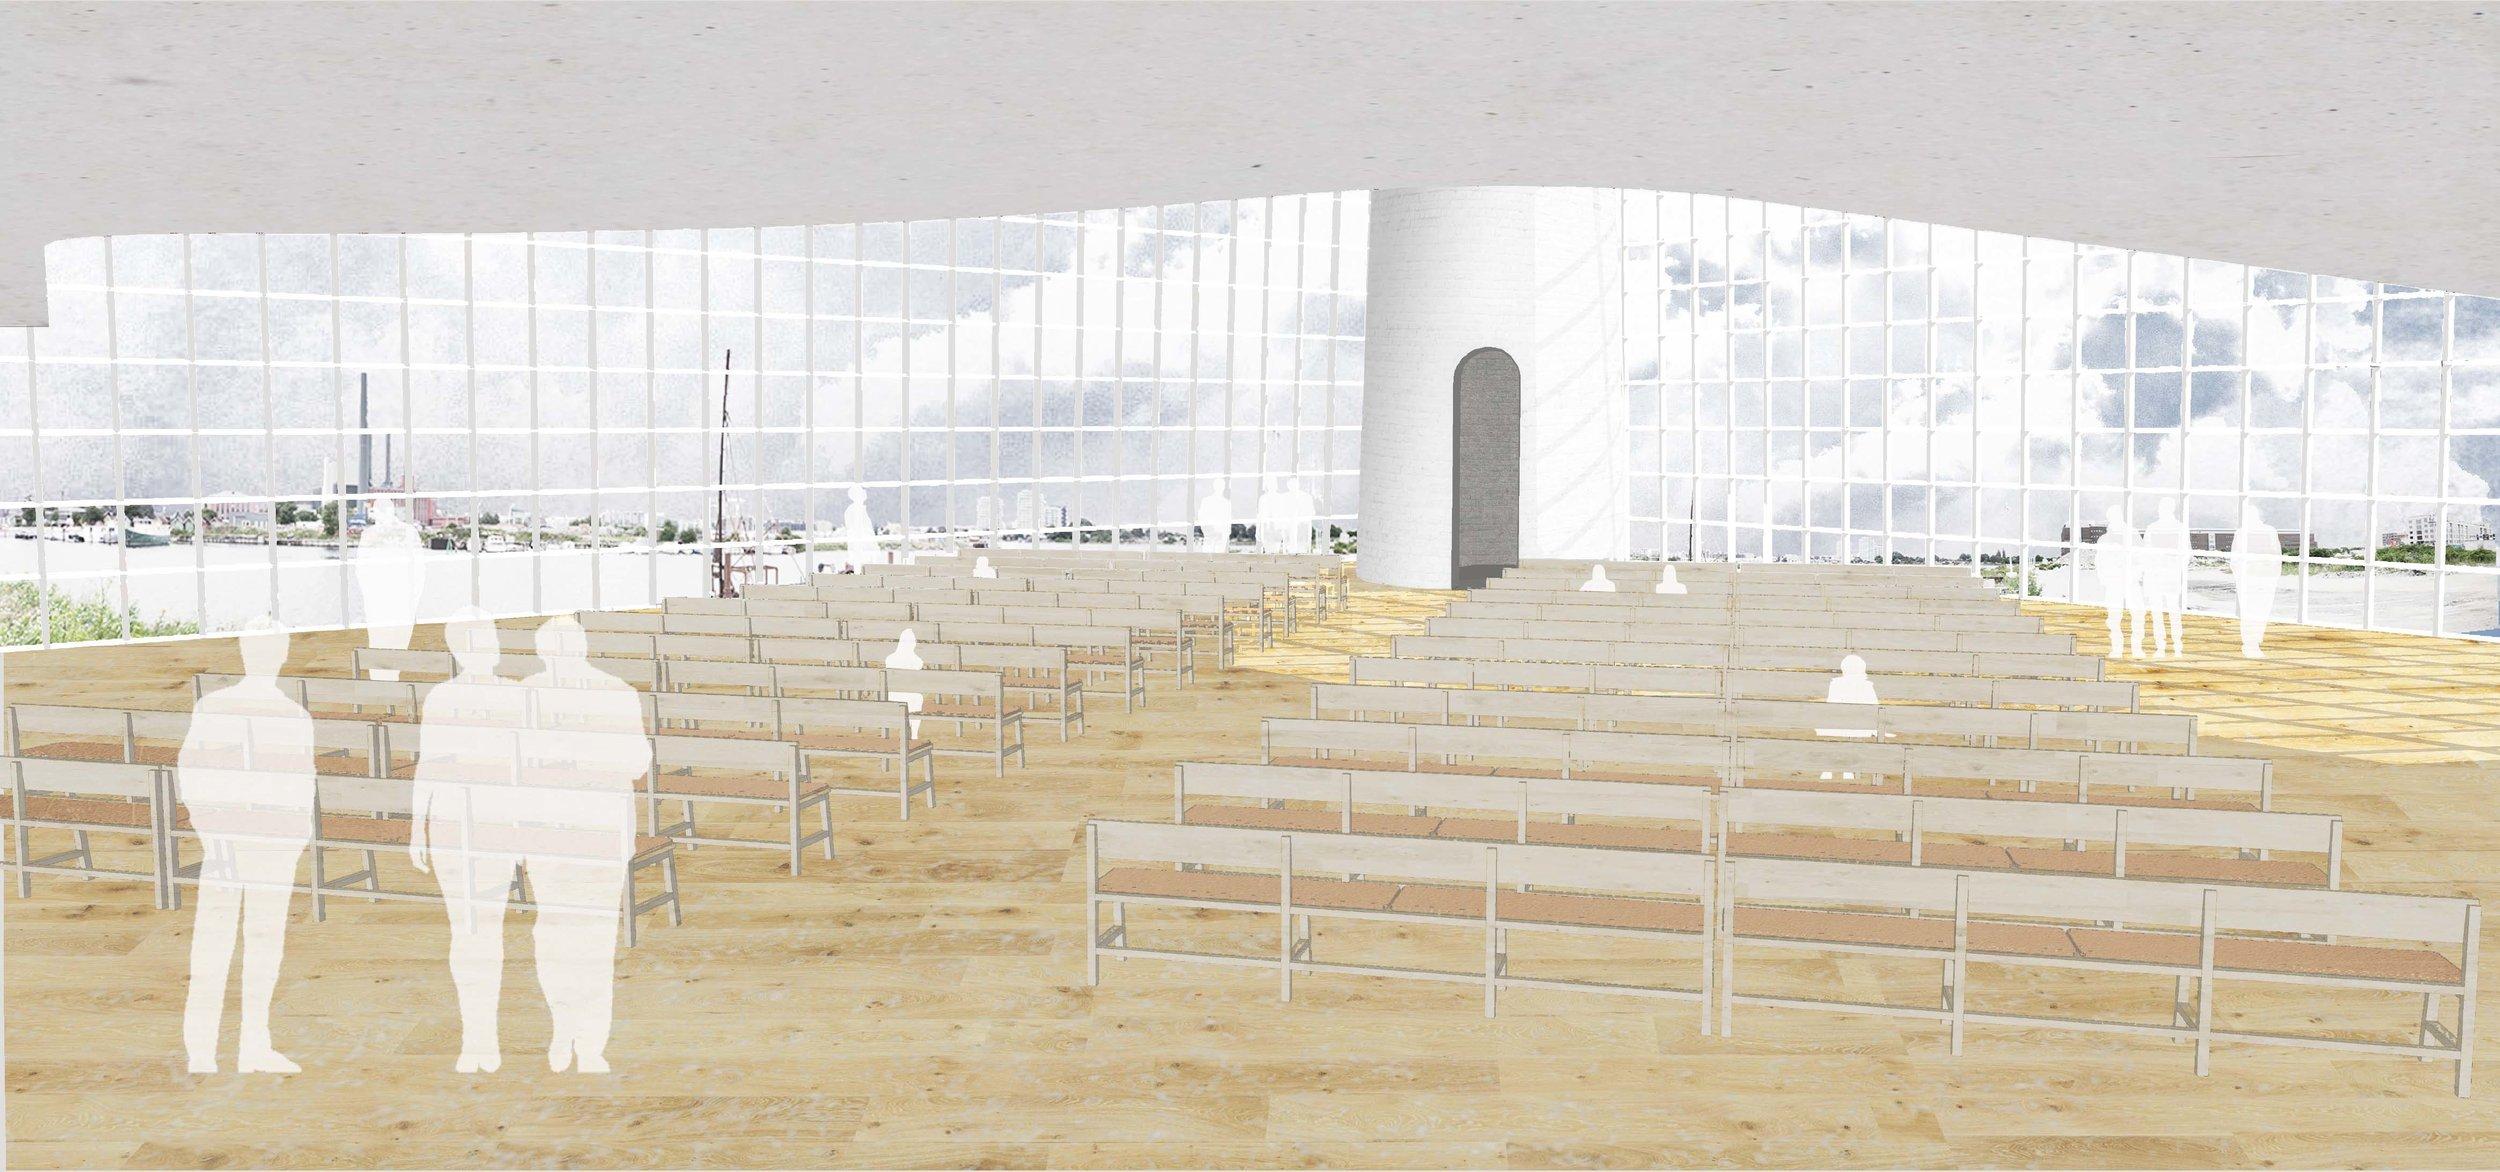 Church Space Visualization, Megan Blake, 2016.